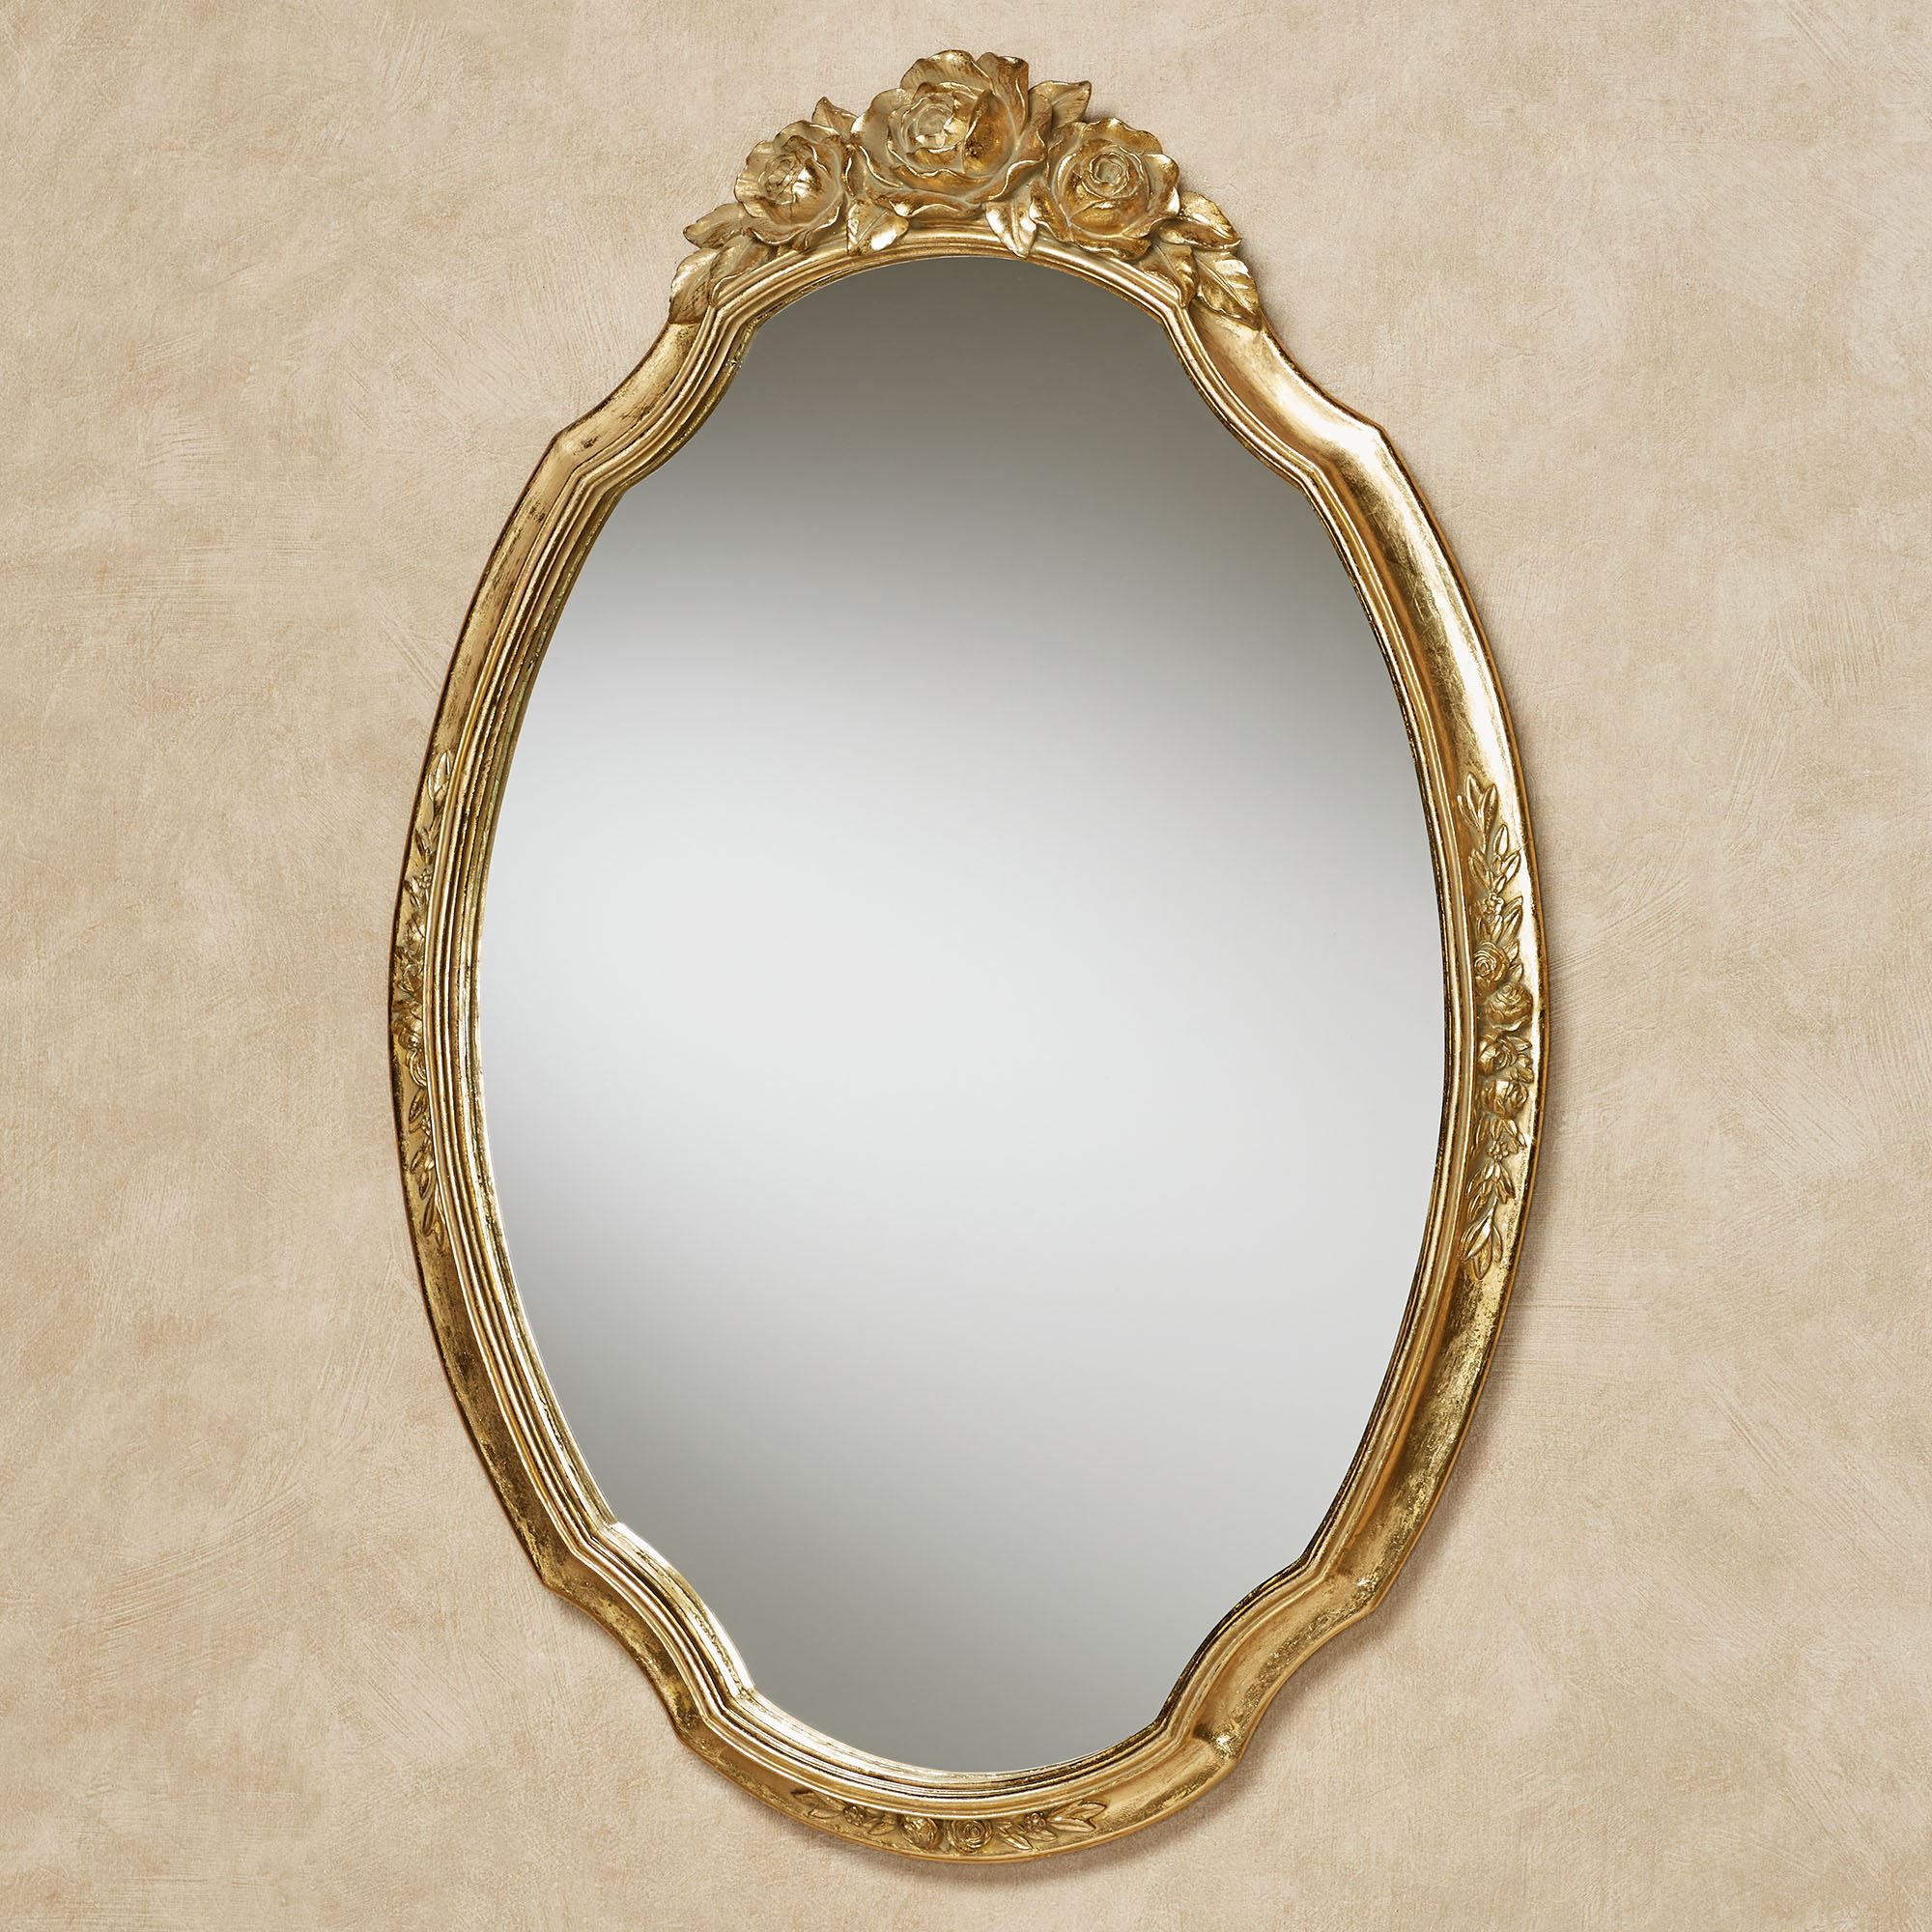 Jorah Rose Oval Wall Mirror